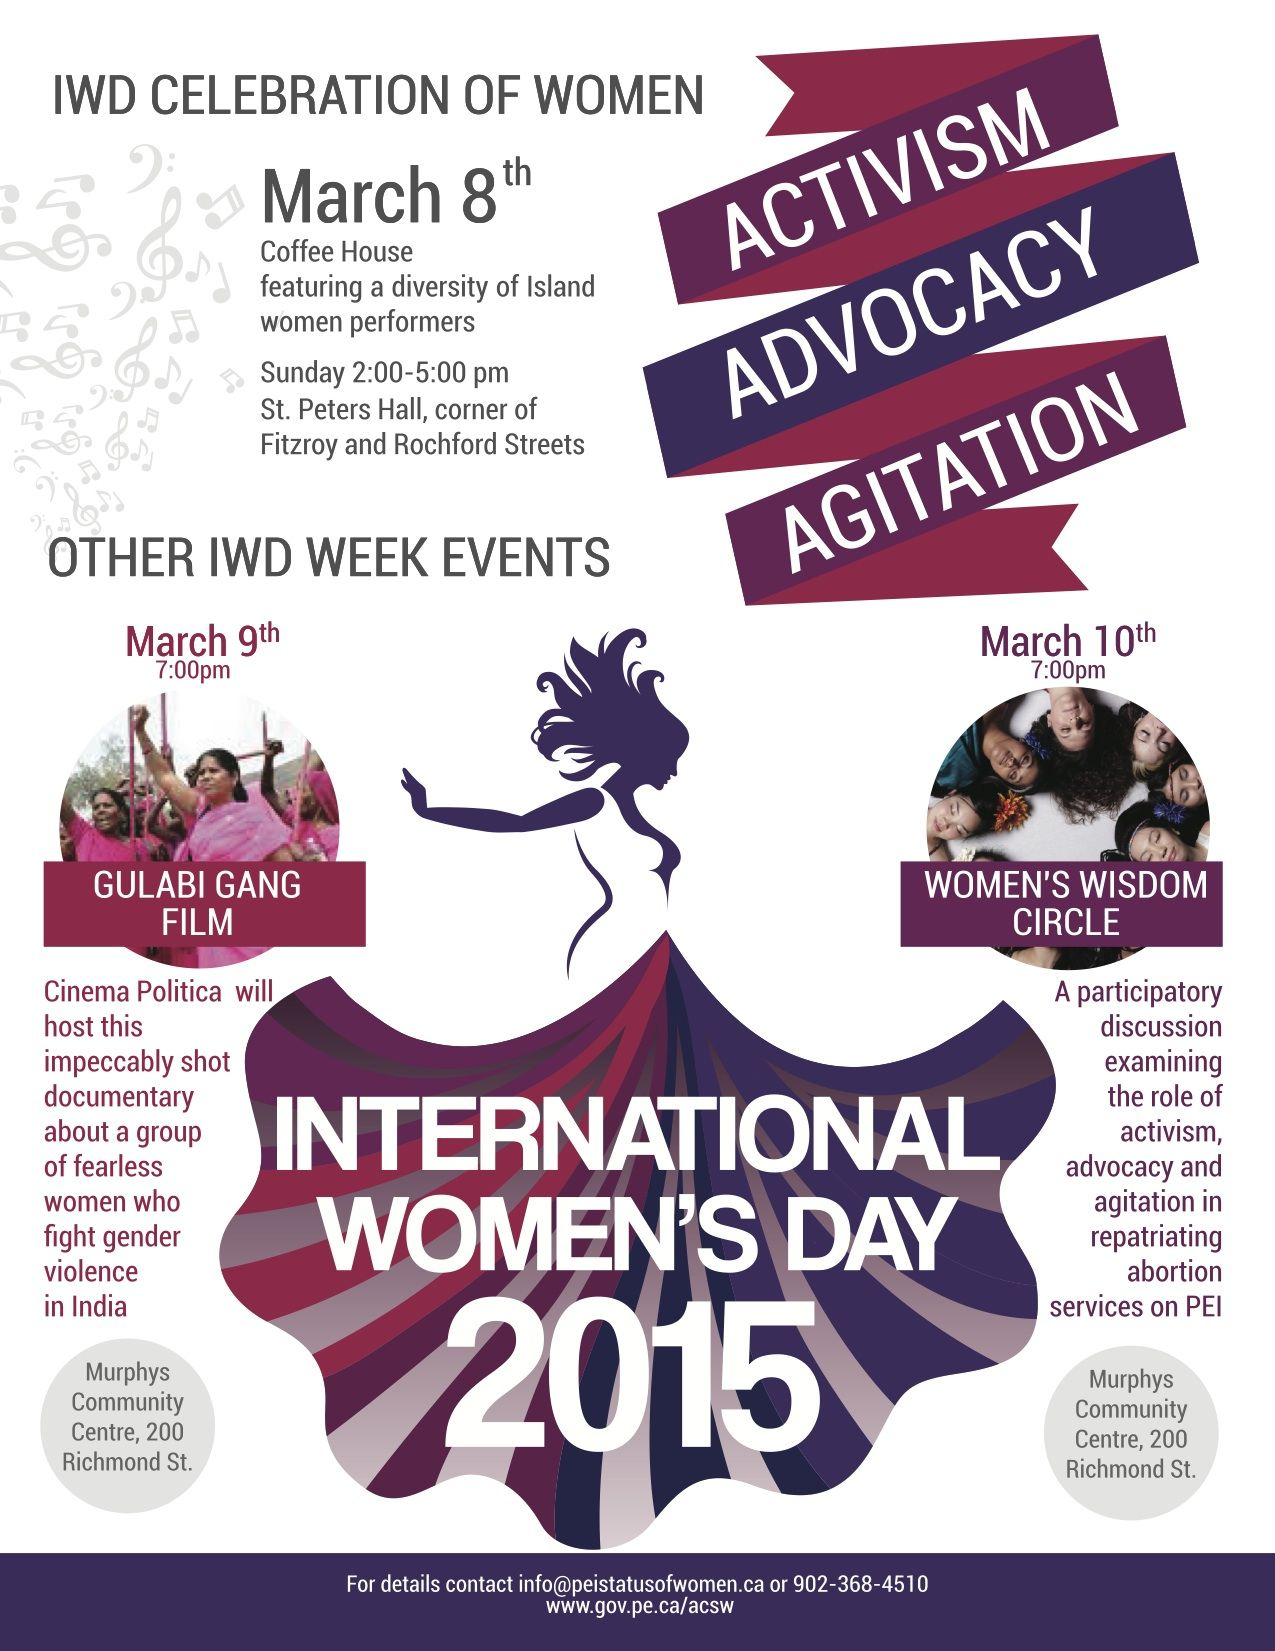 International Women's Day 2015 Poster